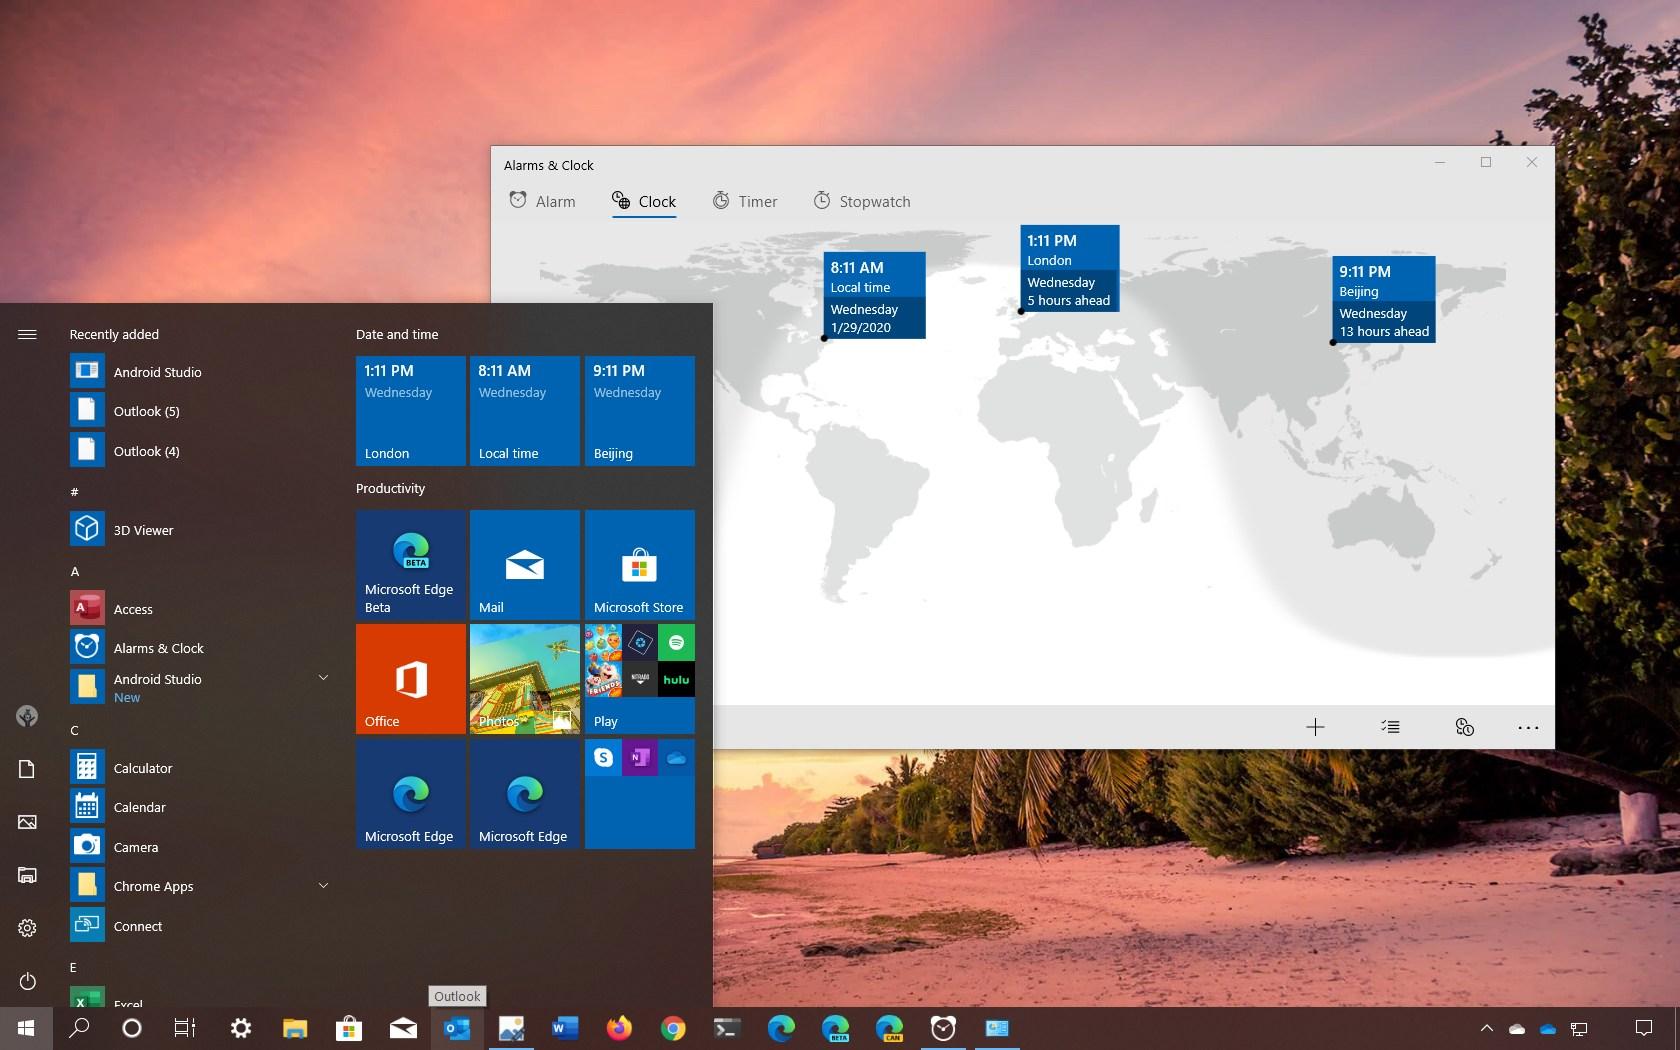 Windows 10 Start menu with clocks